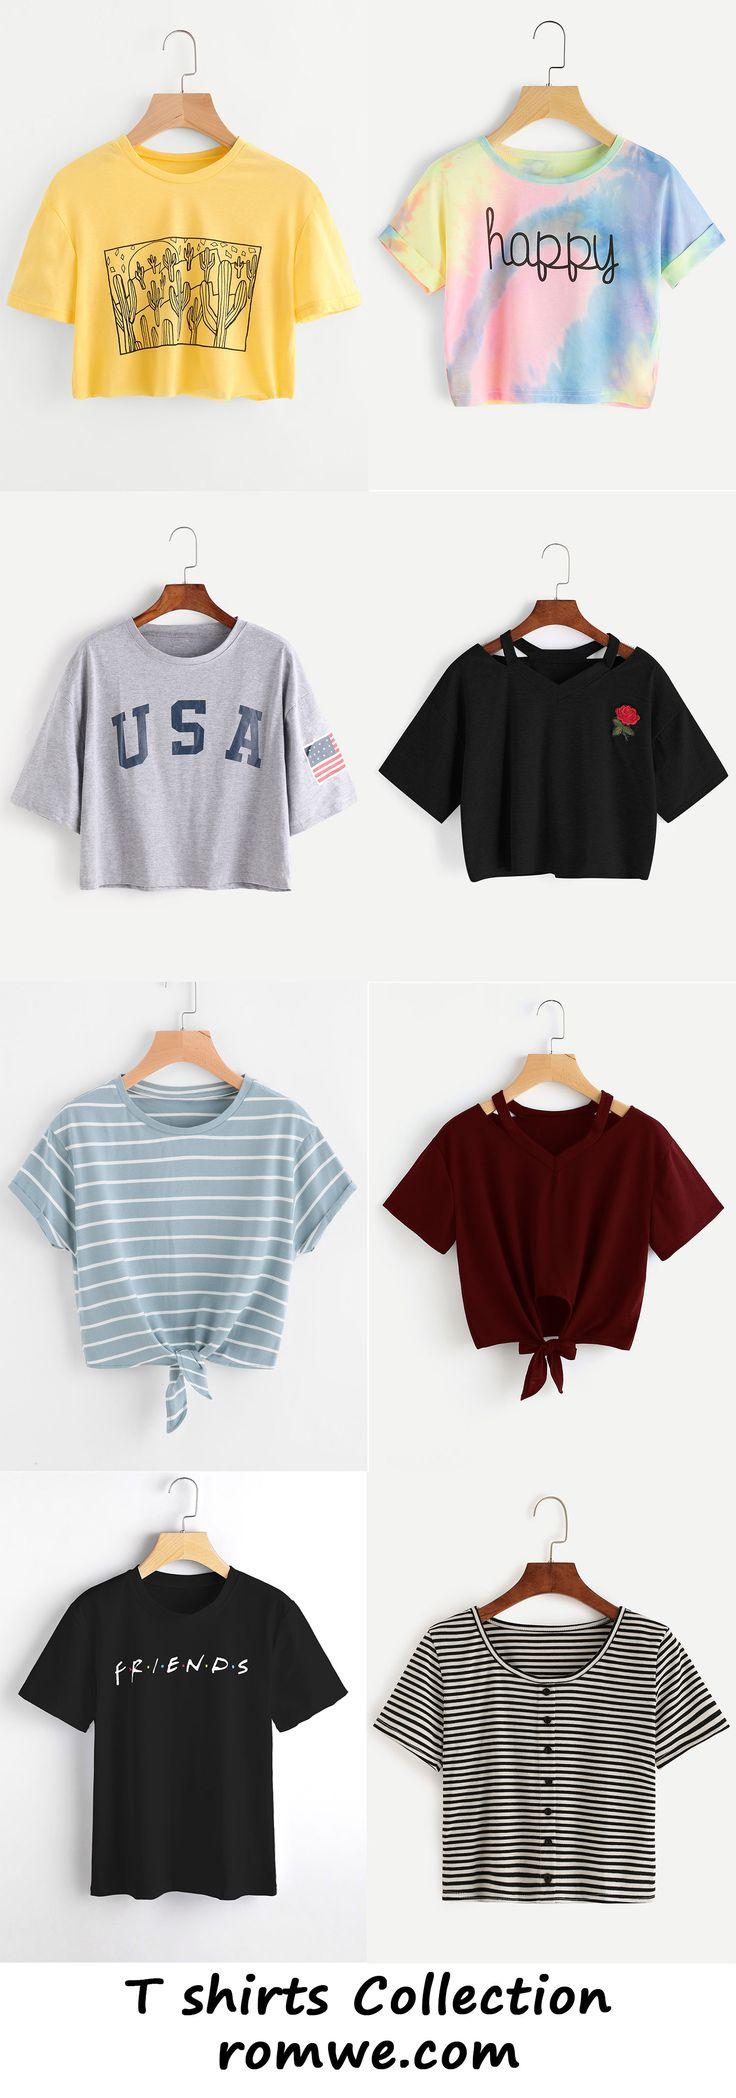 t shirts collection - romwe.com